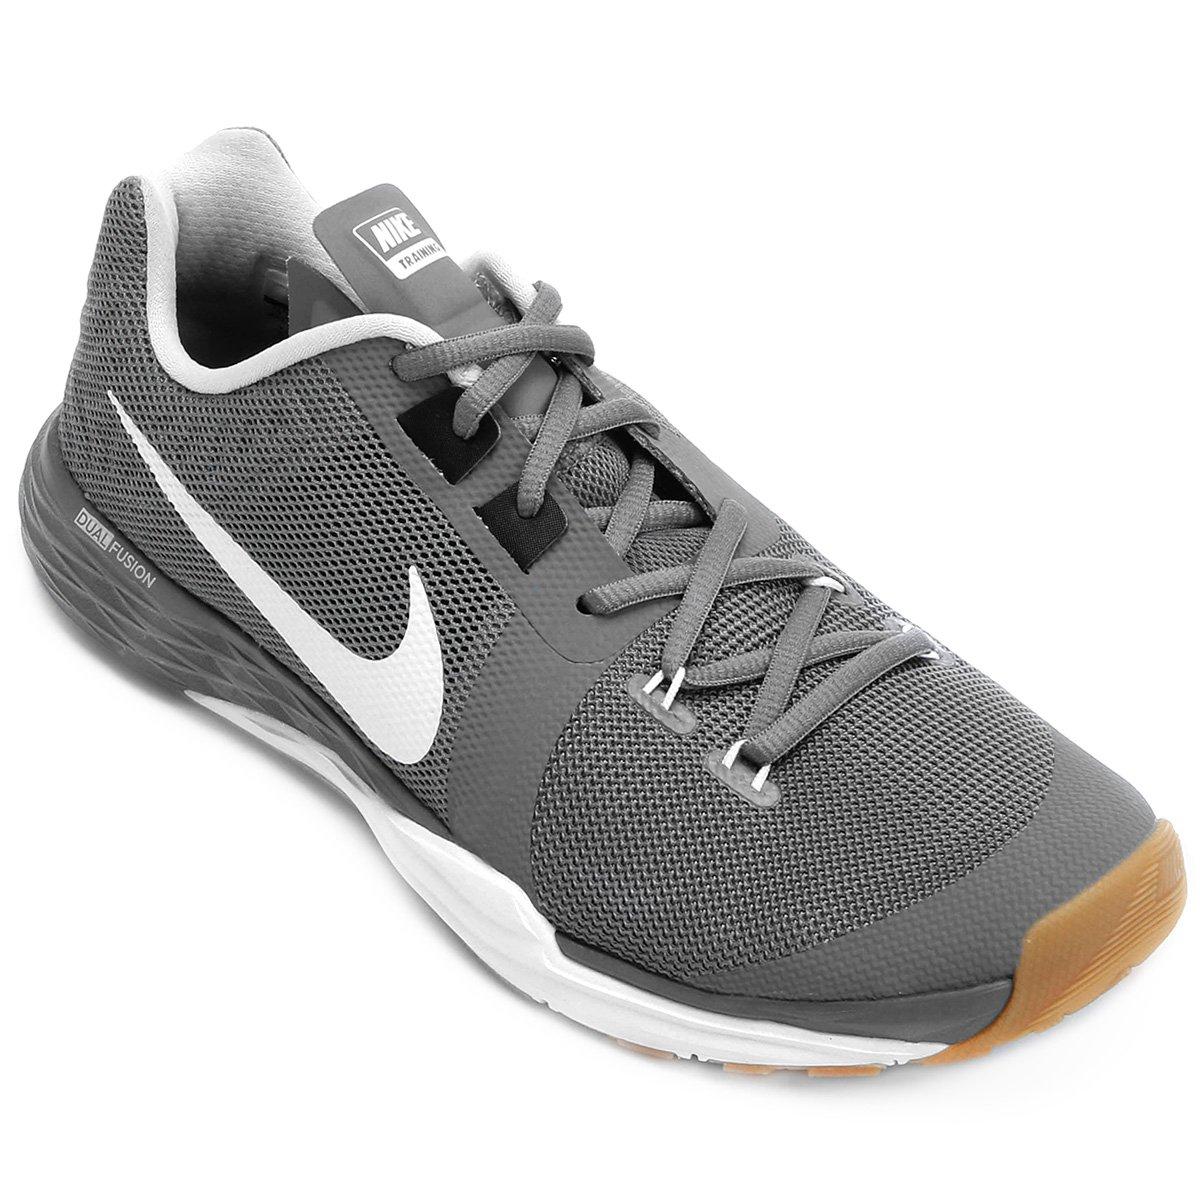 5f1a23a7a Tênis Nike Train Prime Iron DF Masculino - Compre Agora